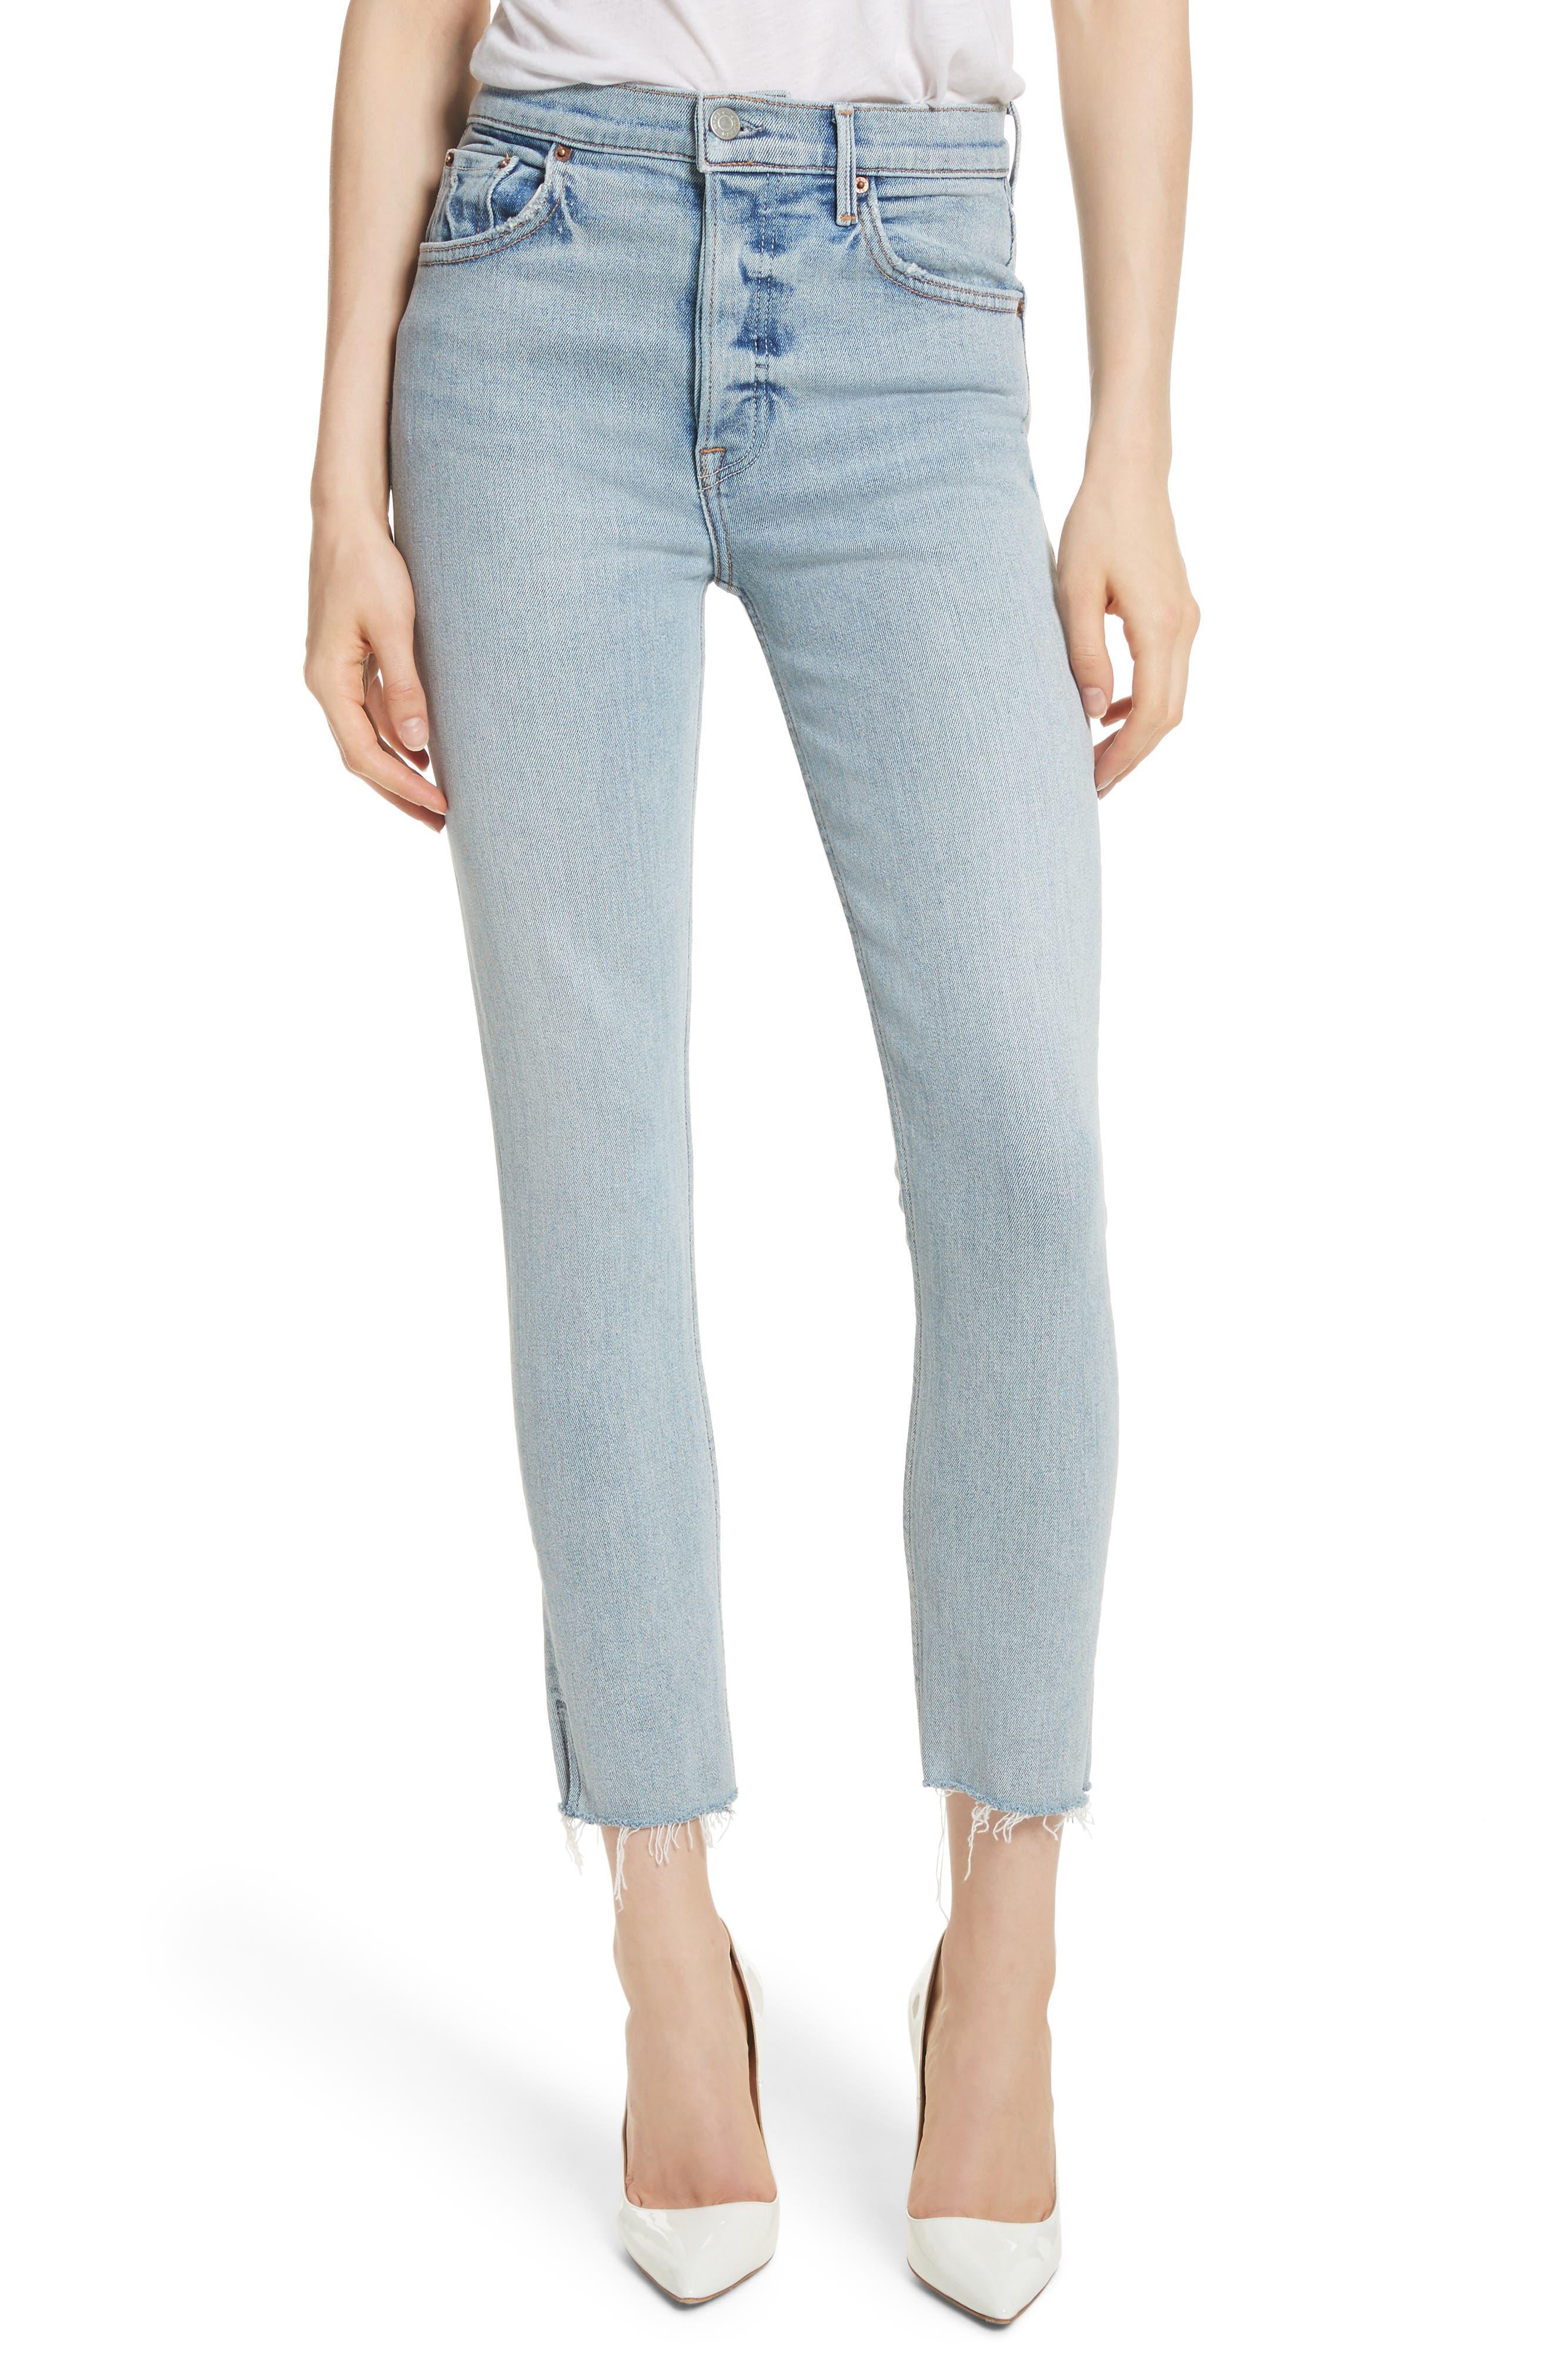 Karolina High Waist Skinny Jeans,                         Main,                         color, TITANIUM